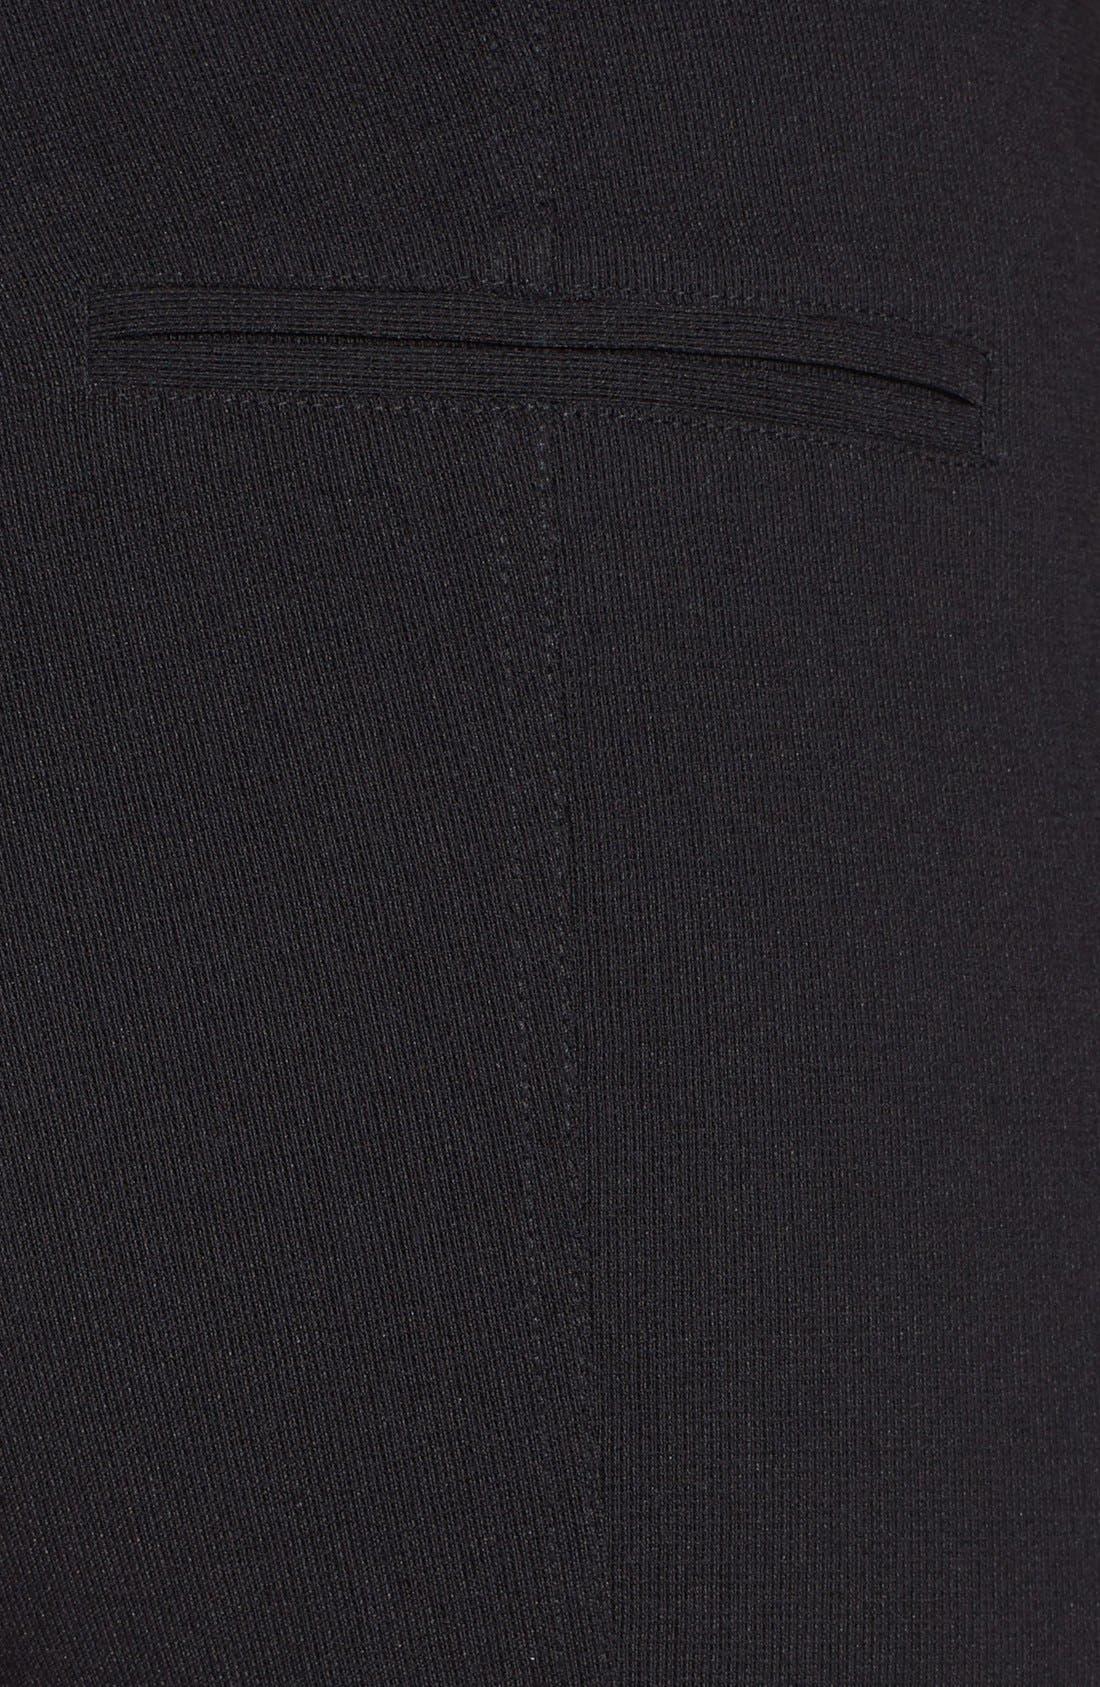 Alternate Image 3  - DKNYC Stretch Woven Skinny Pants